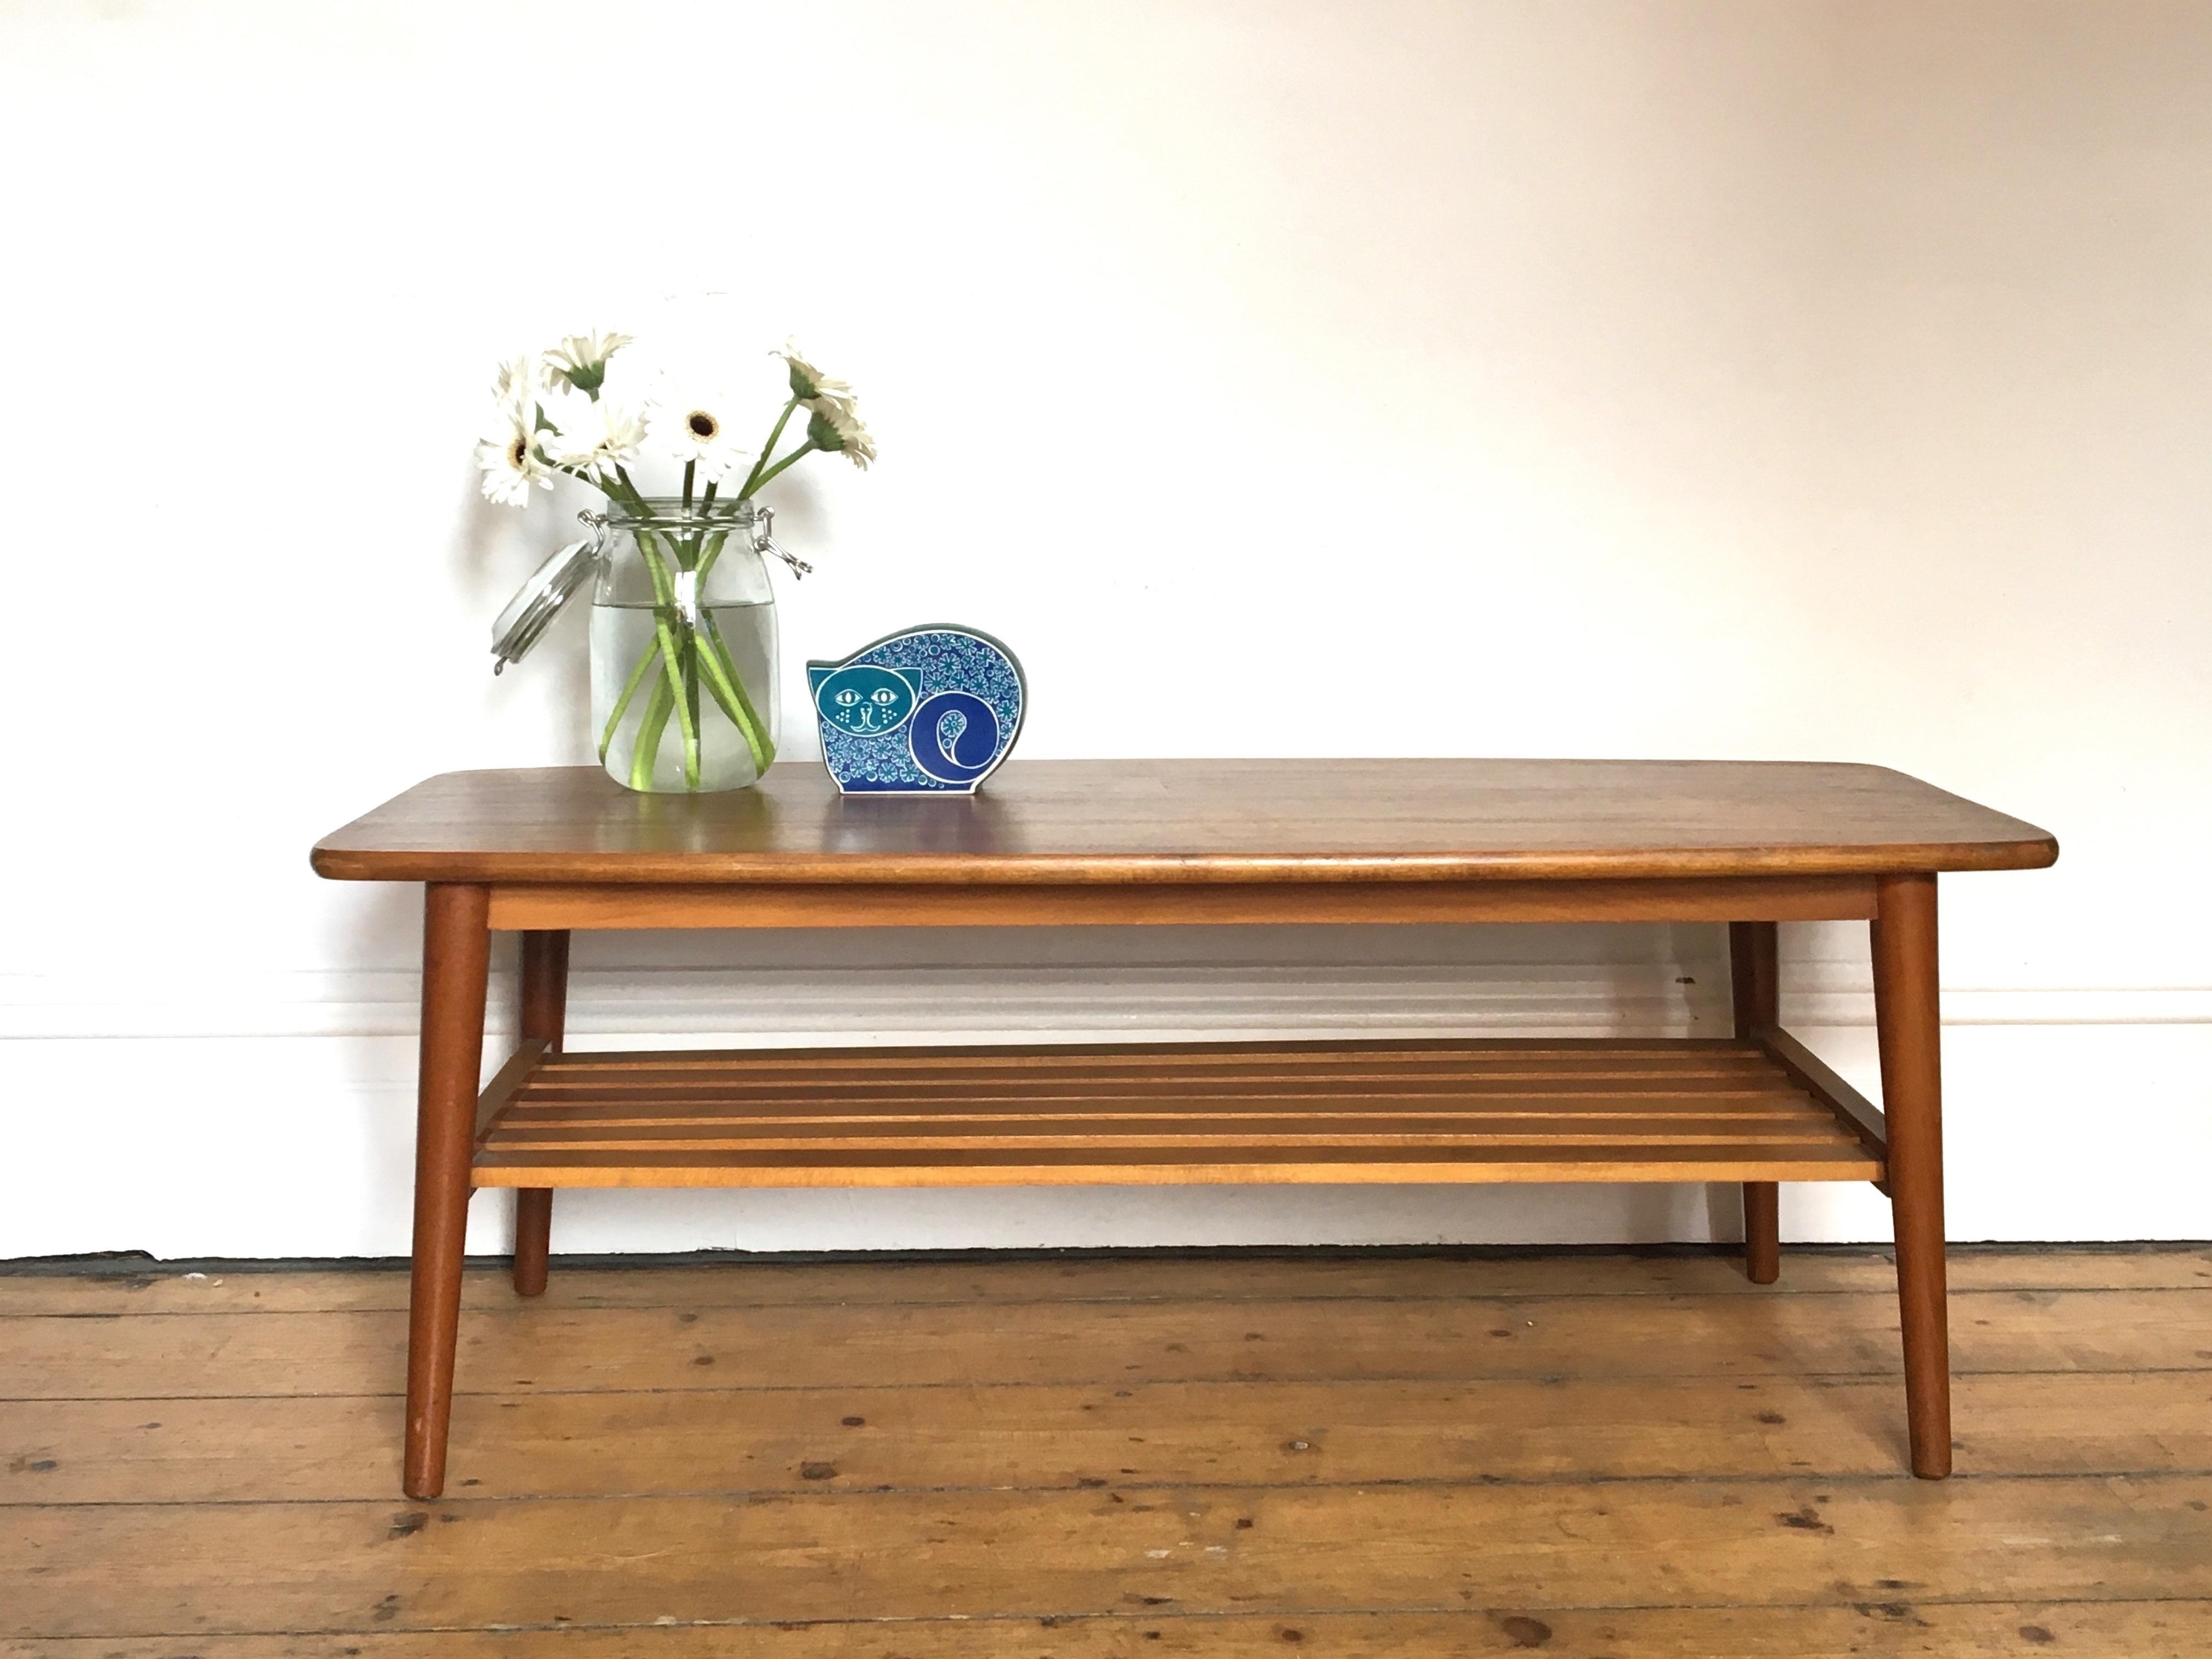 Miraculous Retro Wooden Coffee Table Mid Century Mid Century Design 1960S 1970S Evergreenethics Interior Chair Design Evergreenethicsorg